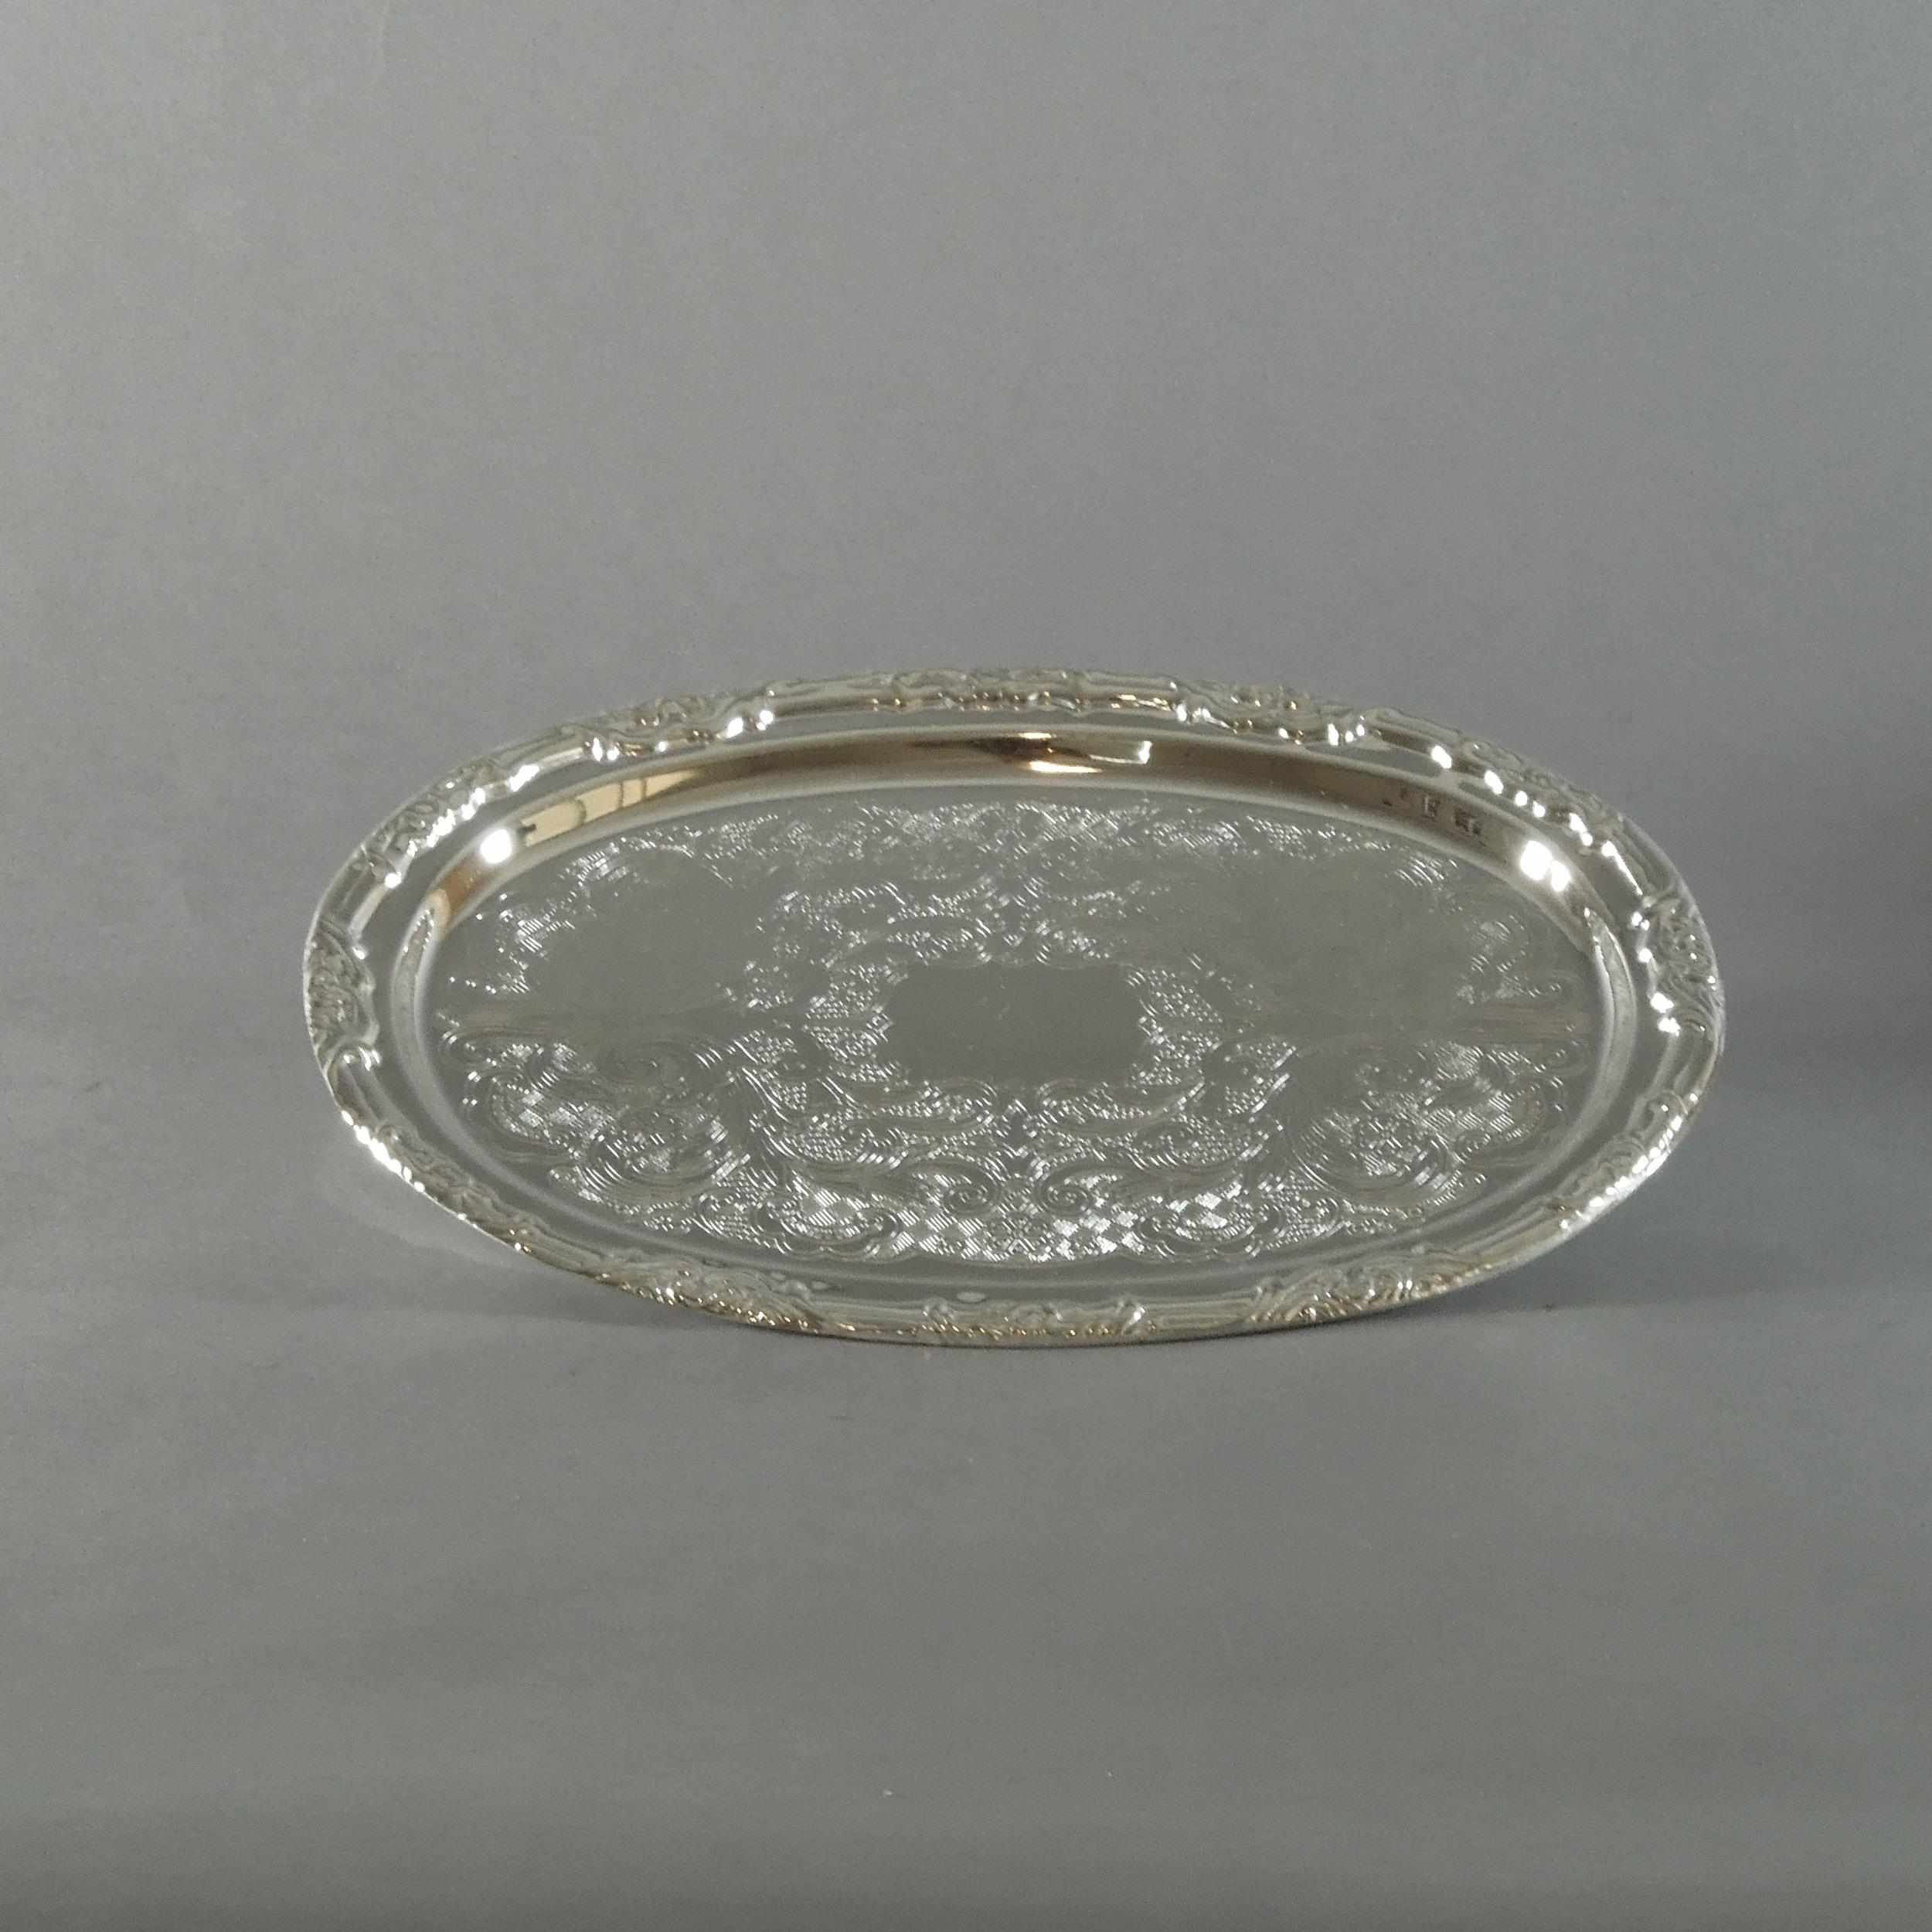 "Silverplate Oval Tray (9""x7"")"